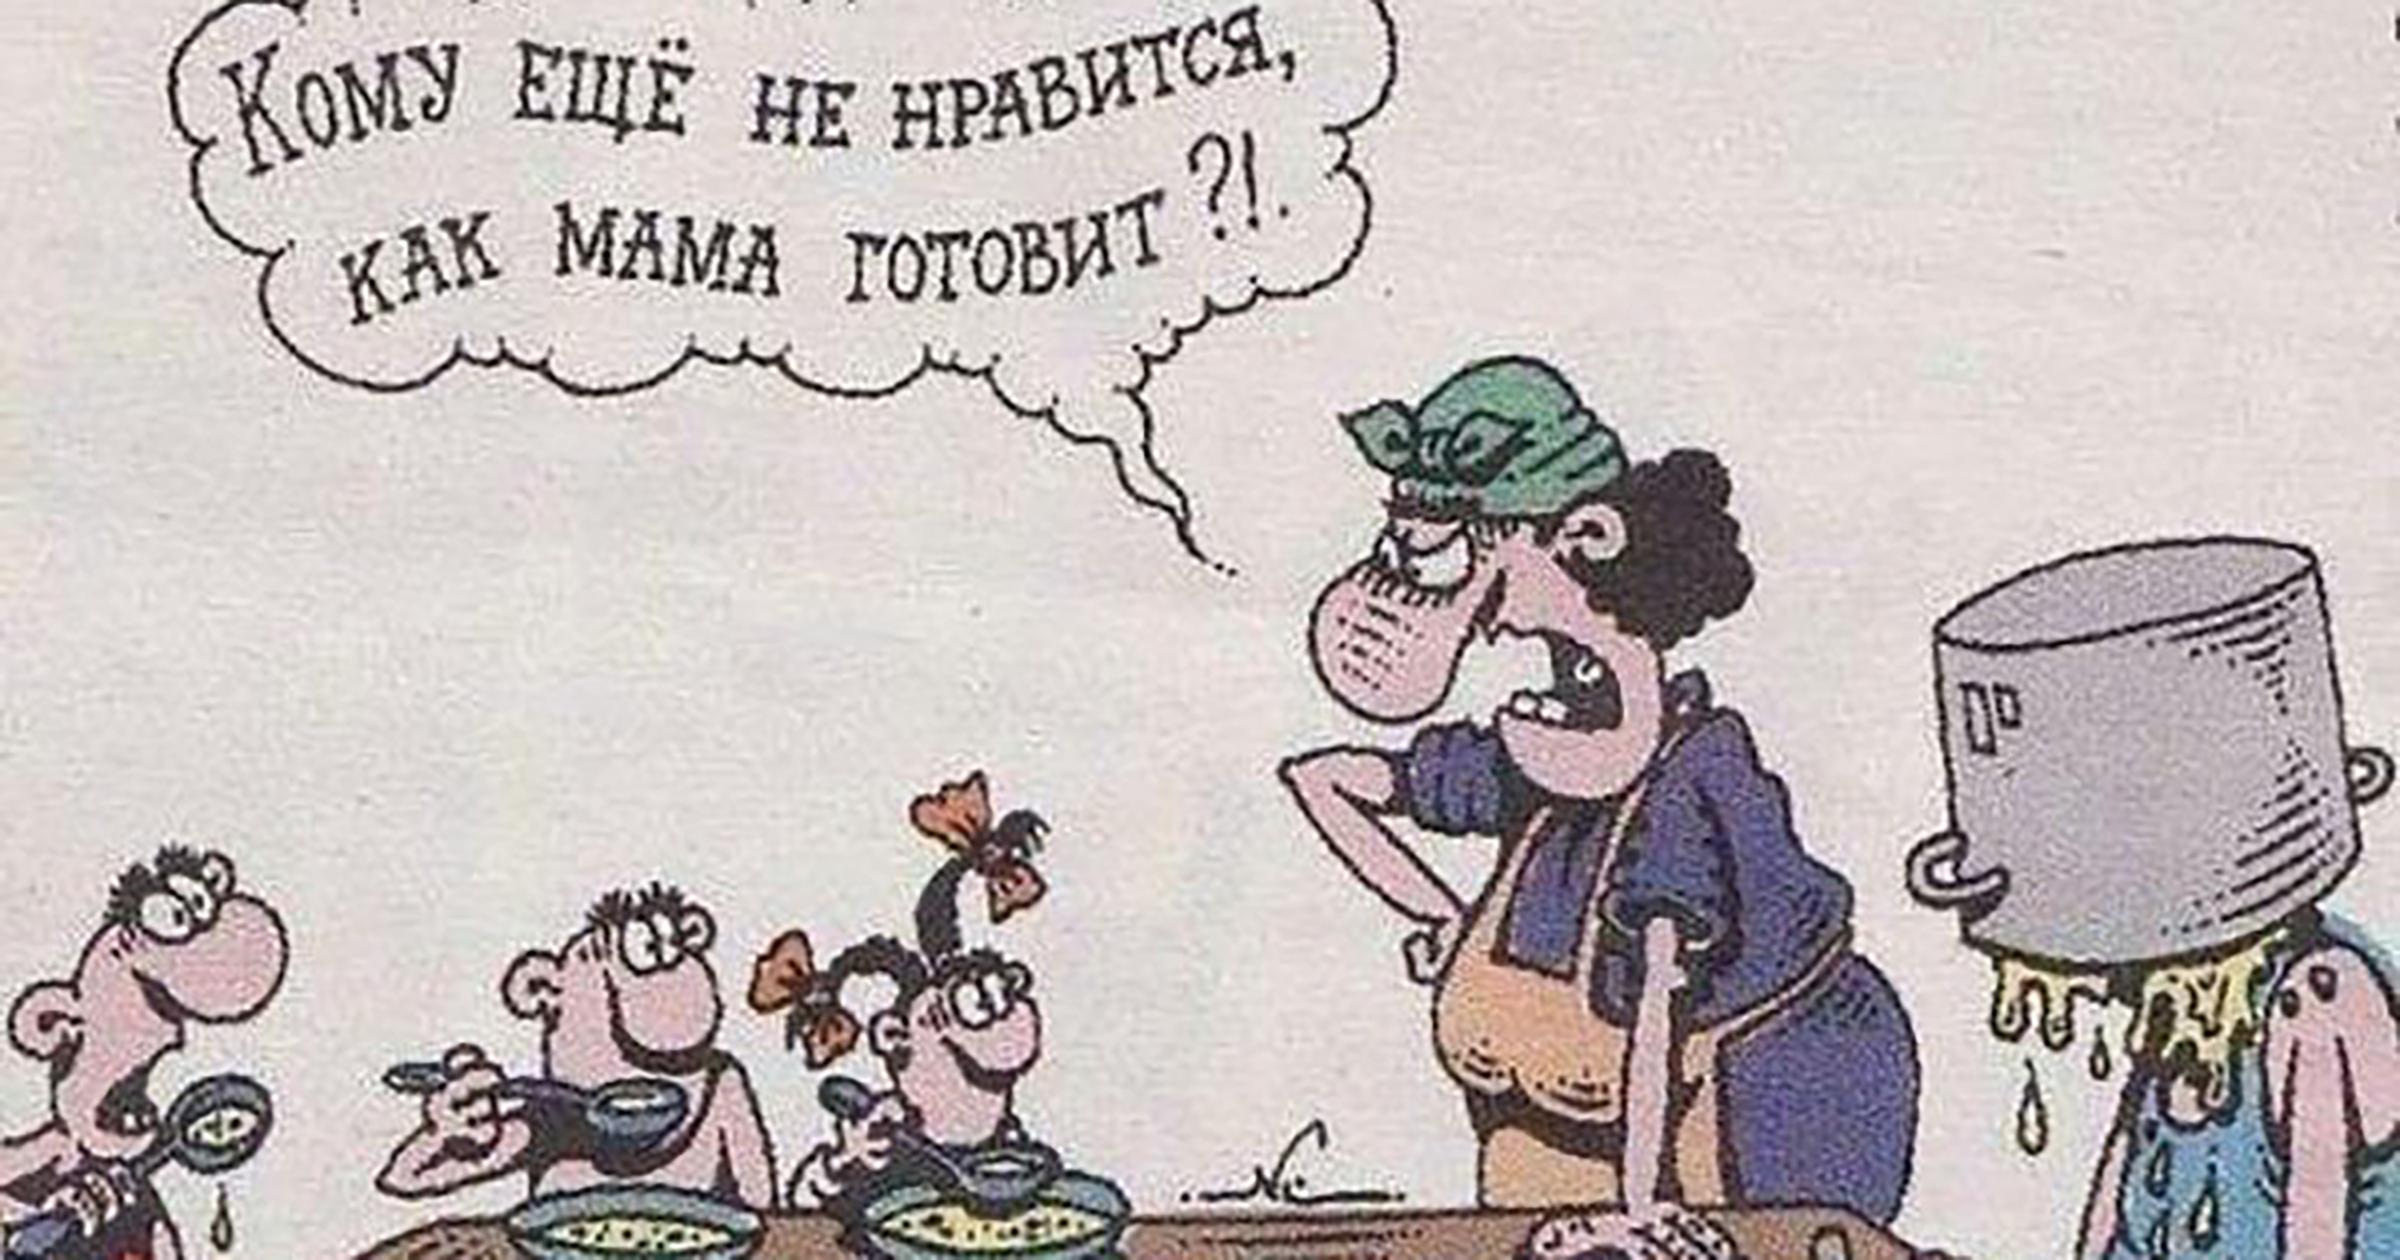 Картинки Кому не нравится как мама готовит   веселые фото (2)